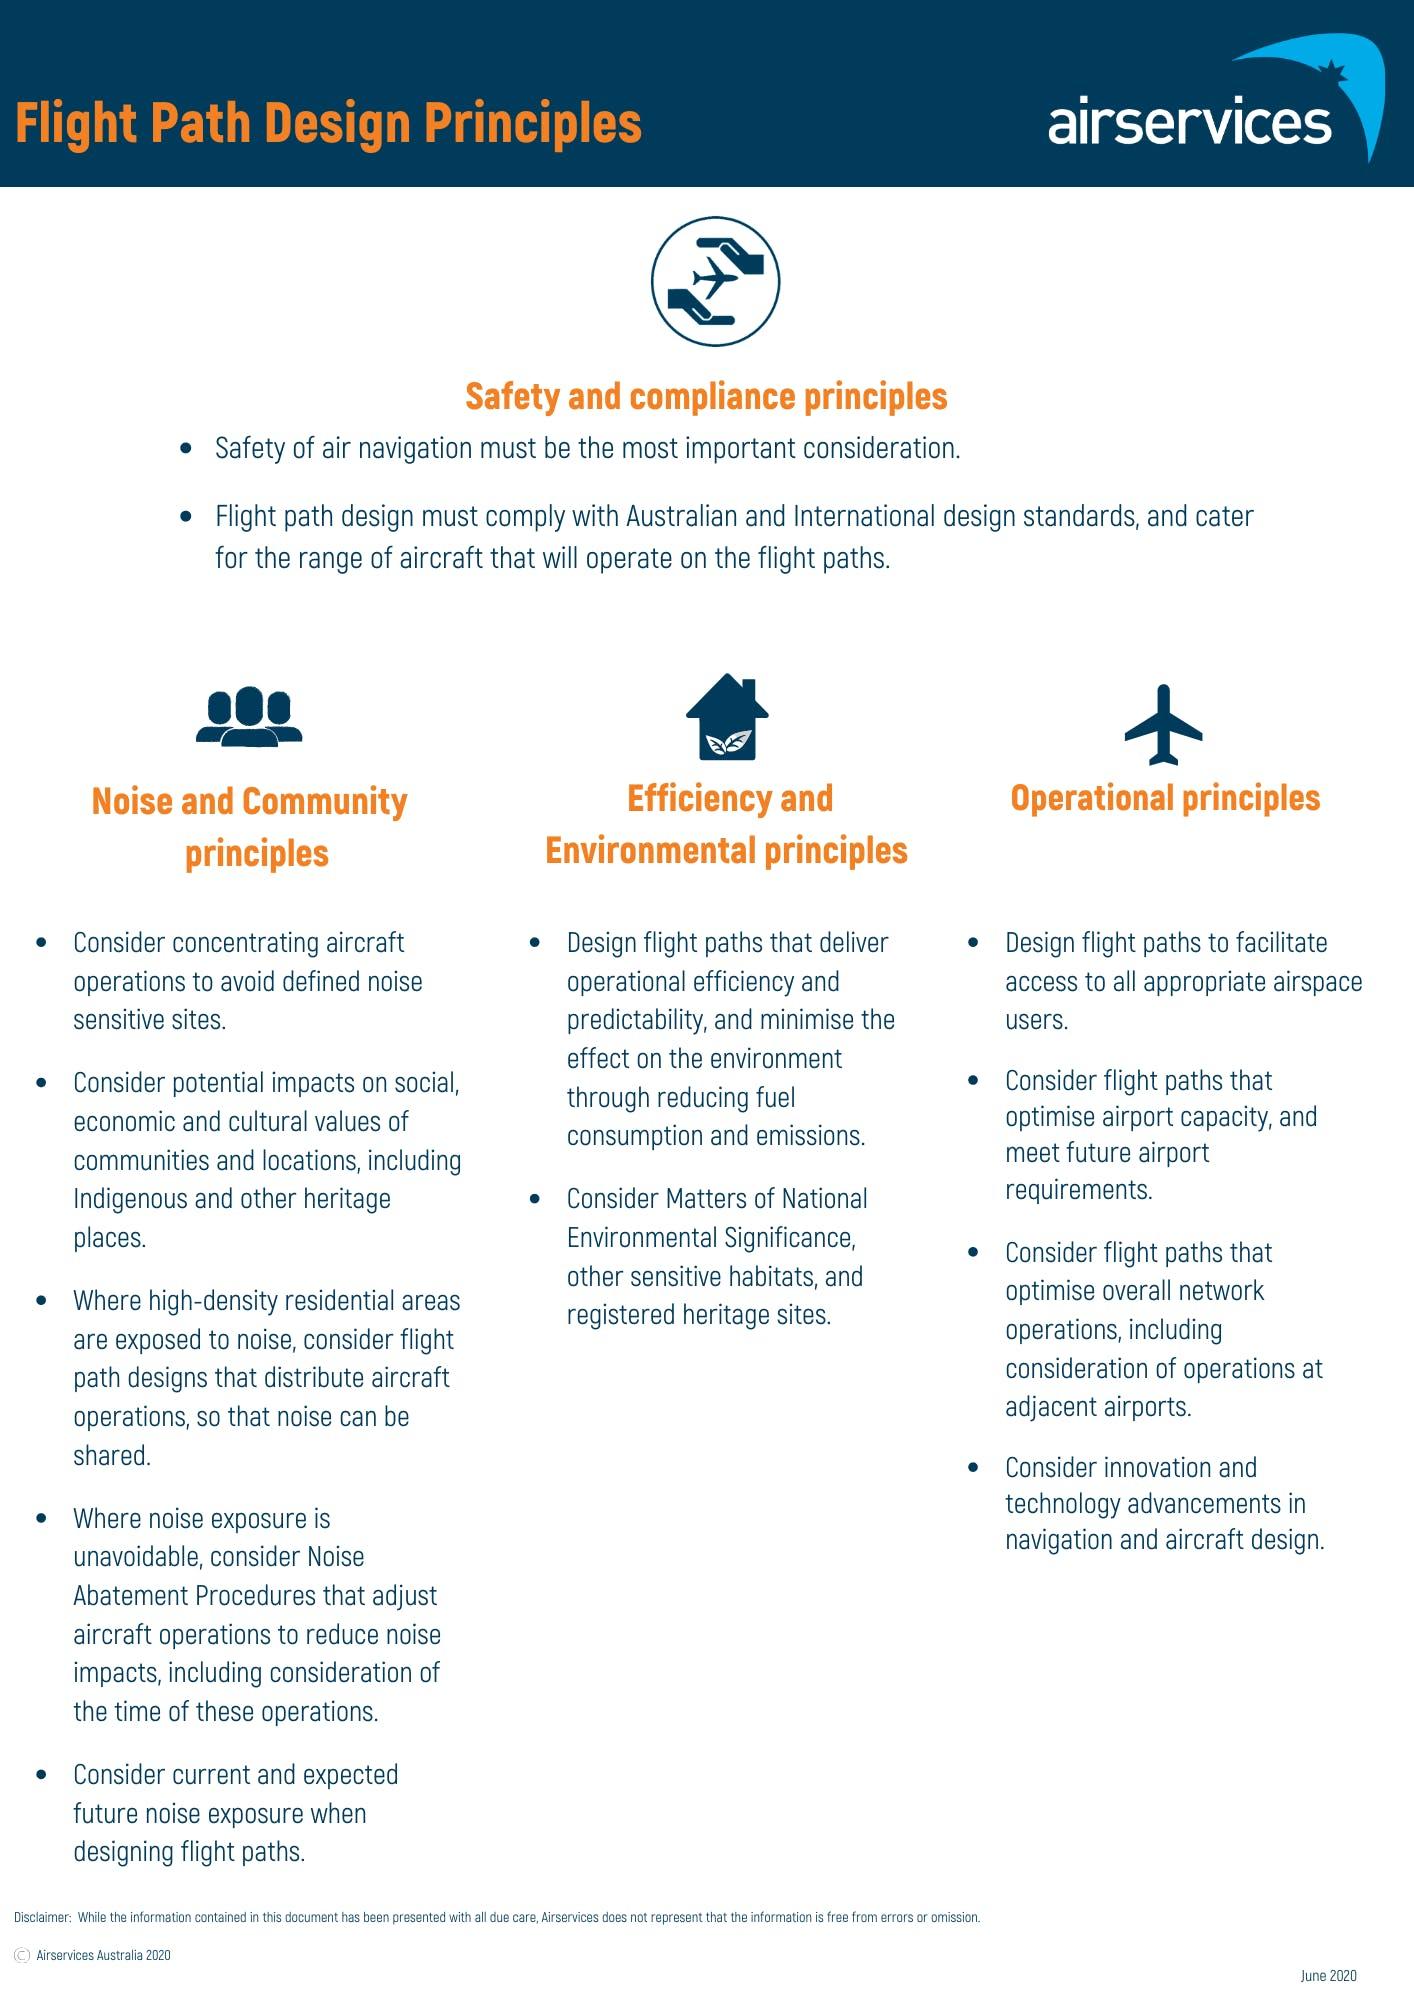 Flight Path Design Principles (June 2020).png